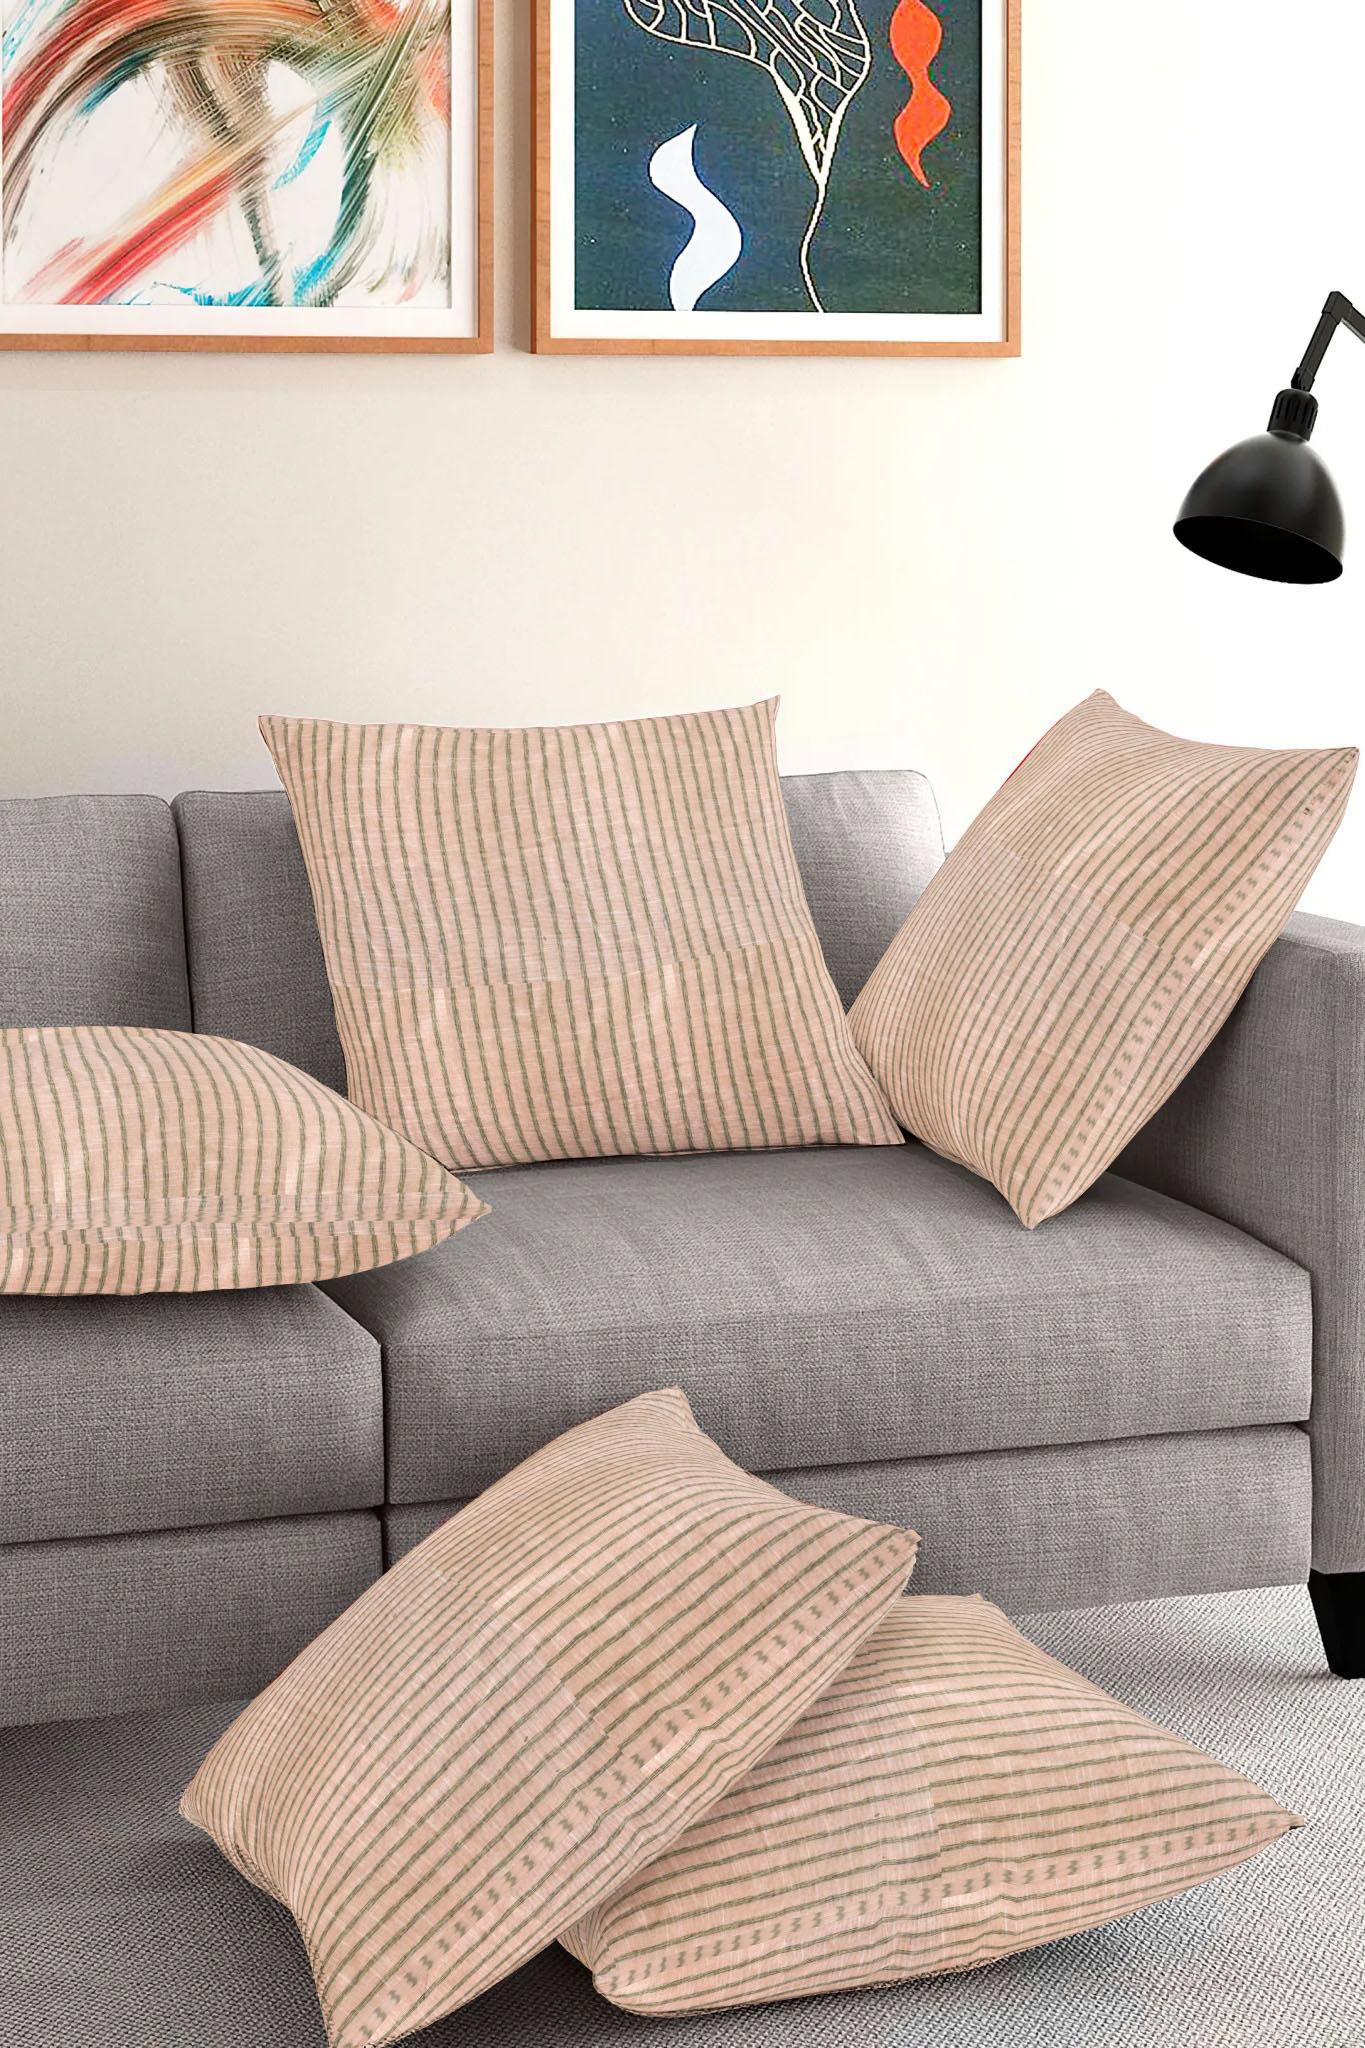 /home/customer/www/fabartcraft.com/public_html/uploadshttps://www.shopolics.com/uploads/images/medium/Beige-Black-Cotton-Cushion-Cover-35398.jpg